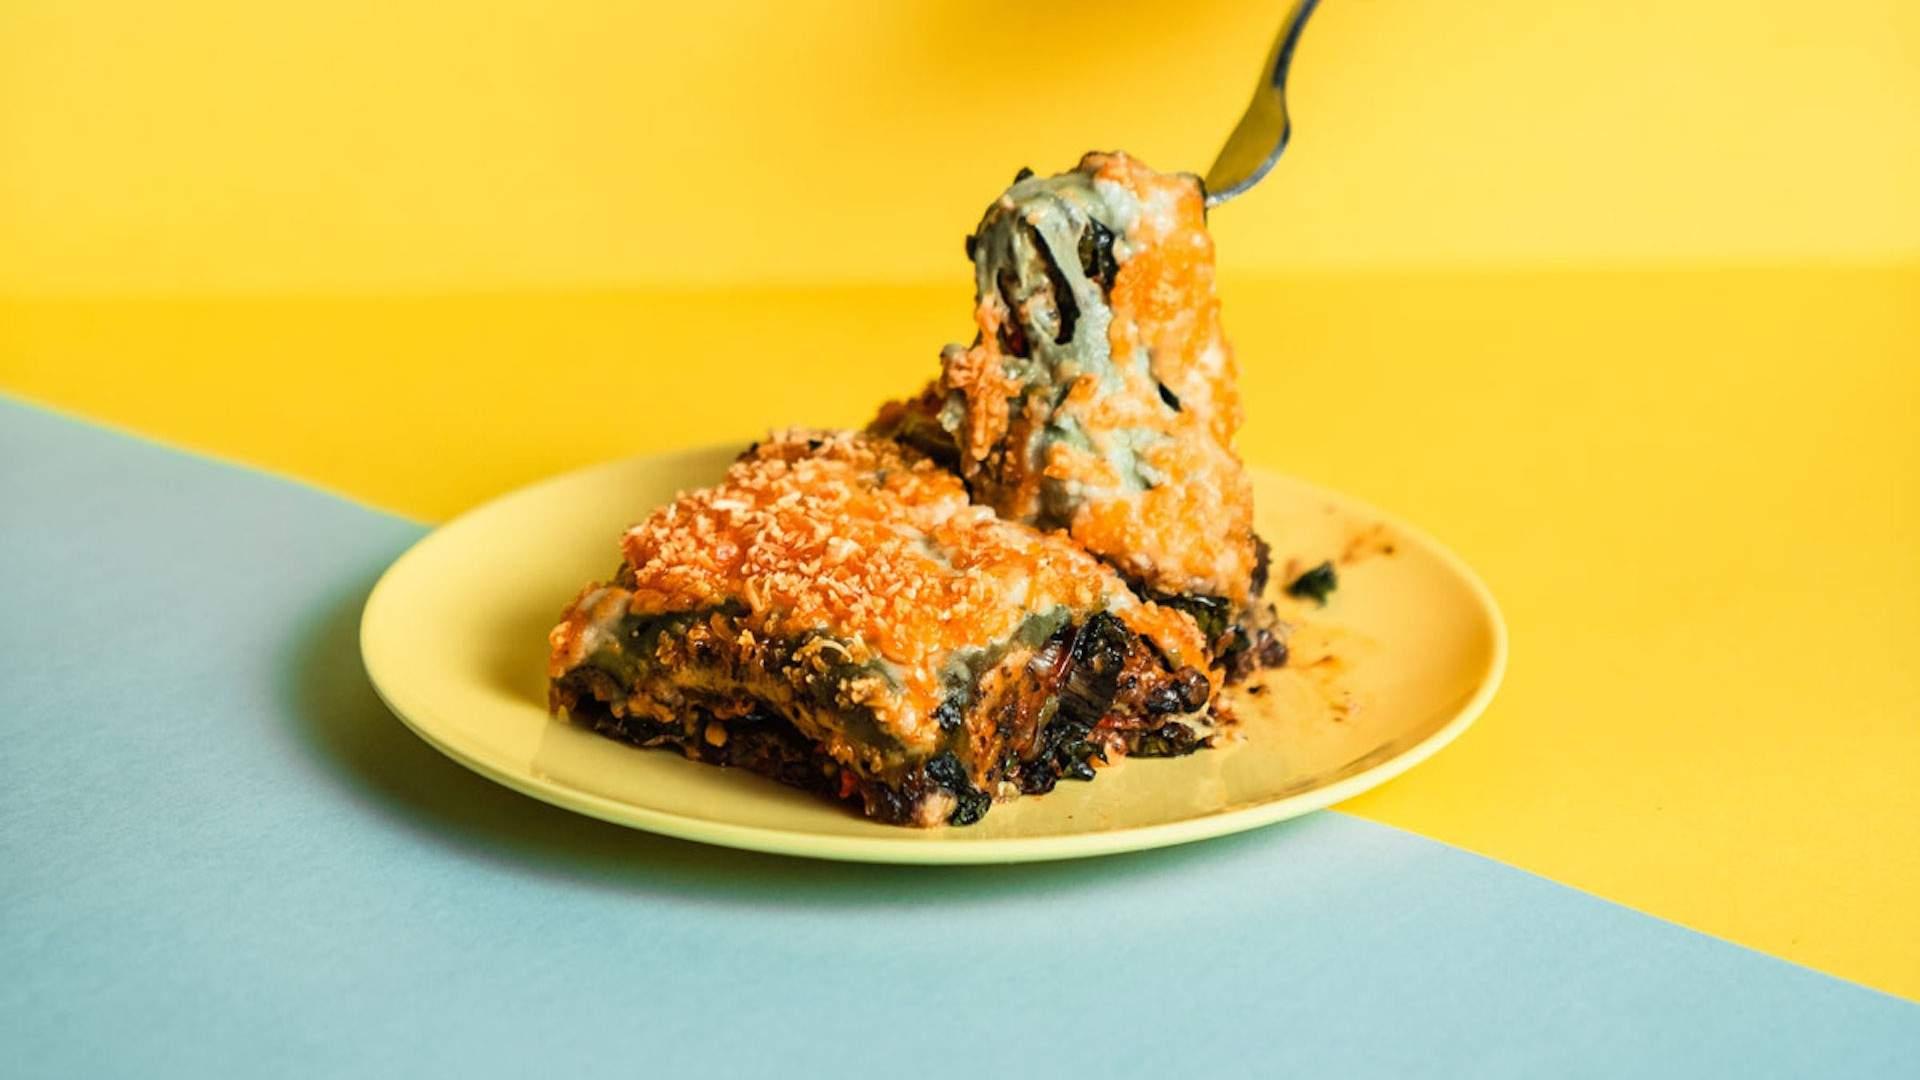 Lasagna Del Rey Is Melbourne's New Pasta Service Delivering Vegan and Organic Beef Slices